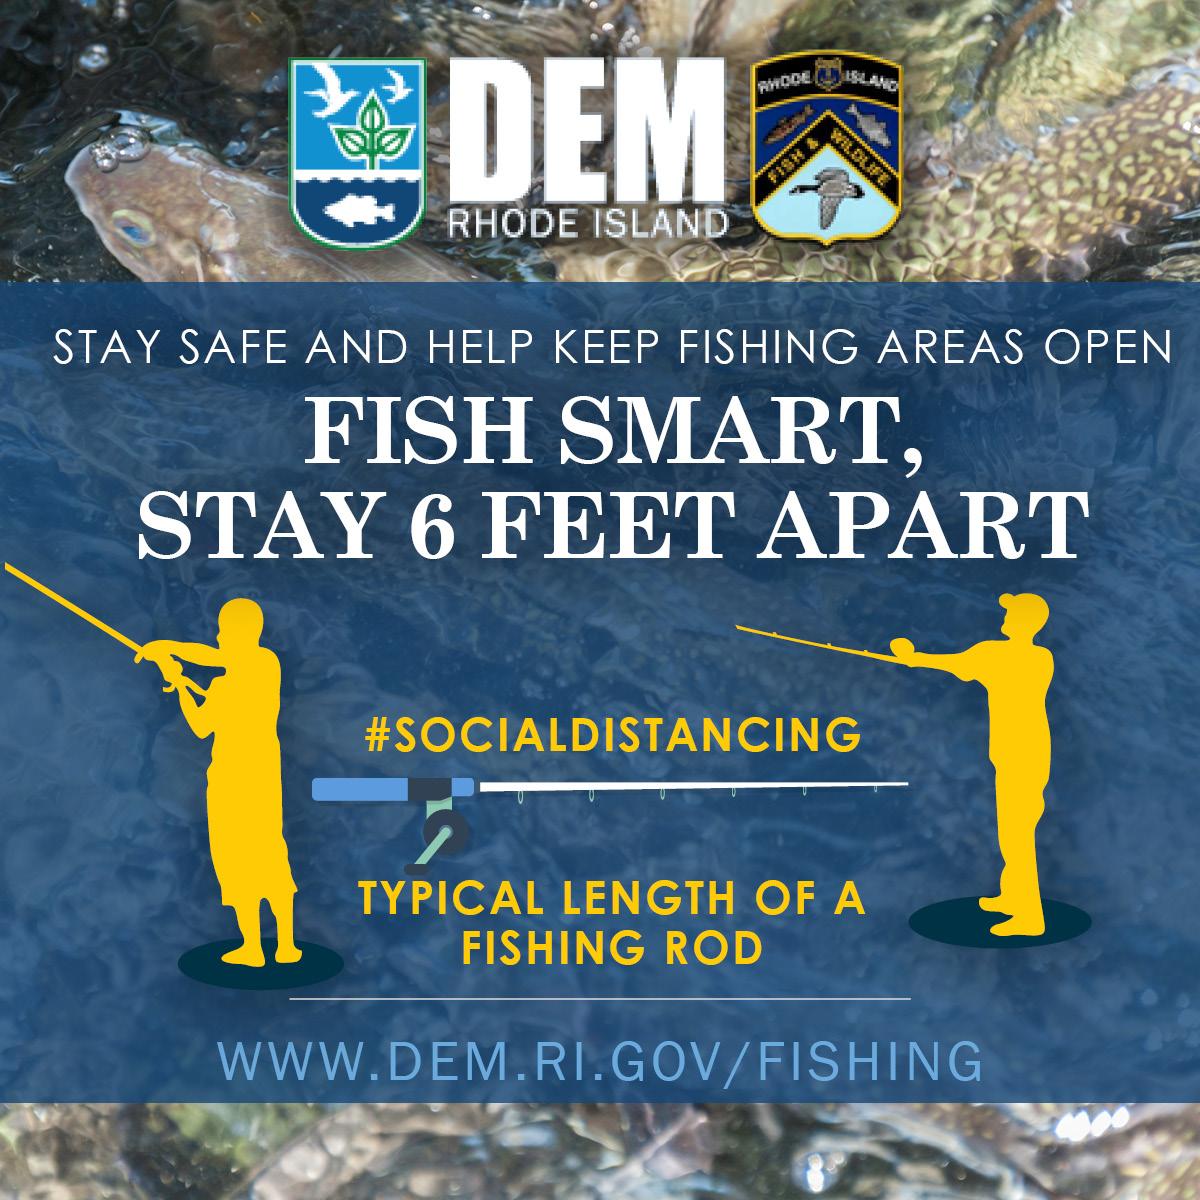 Fish smart. Stay 6 feet apart.